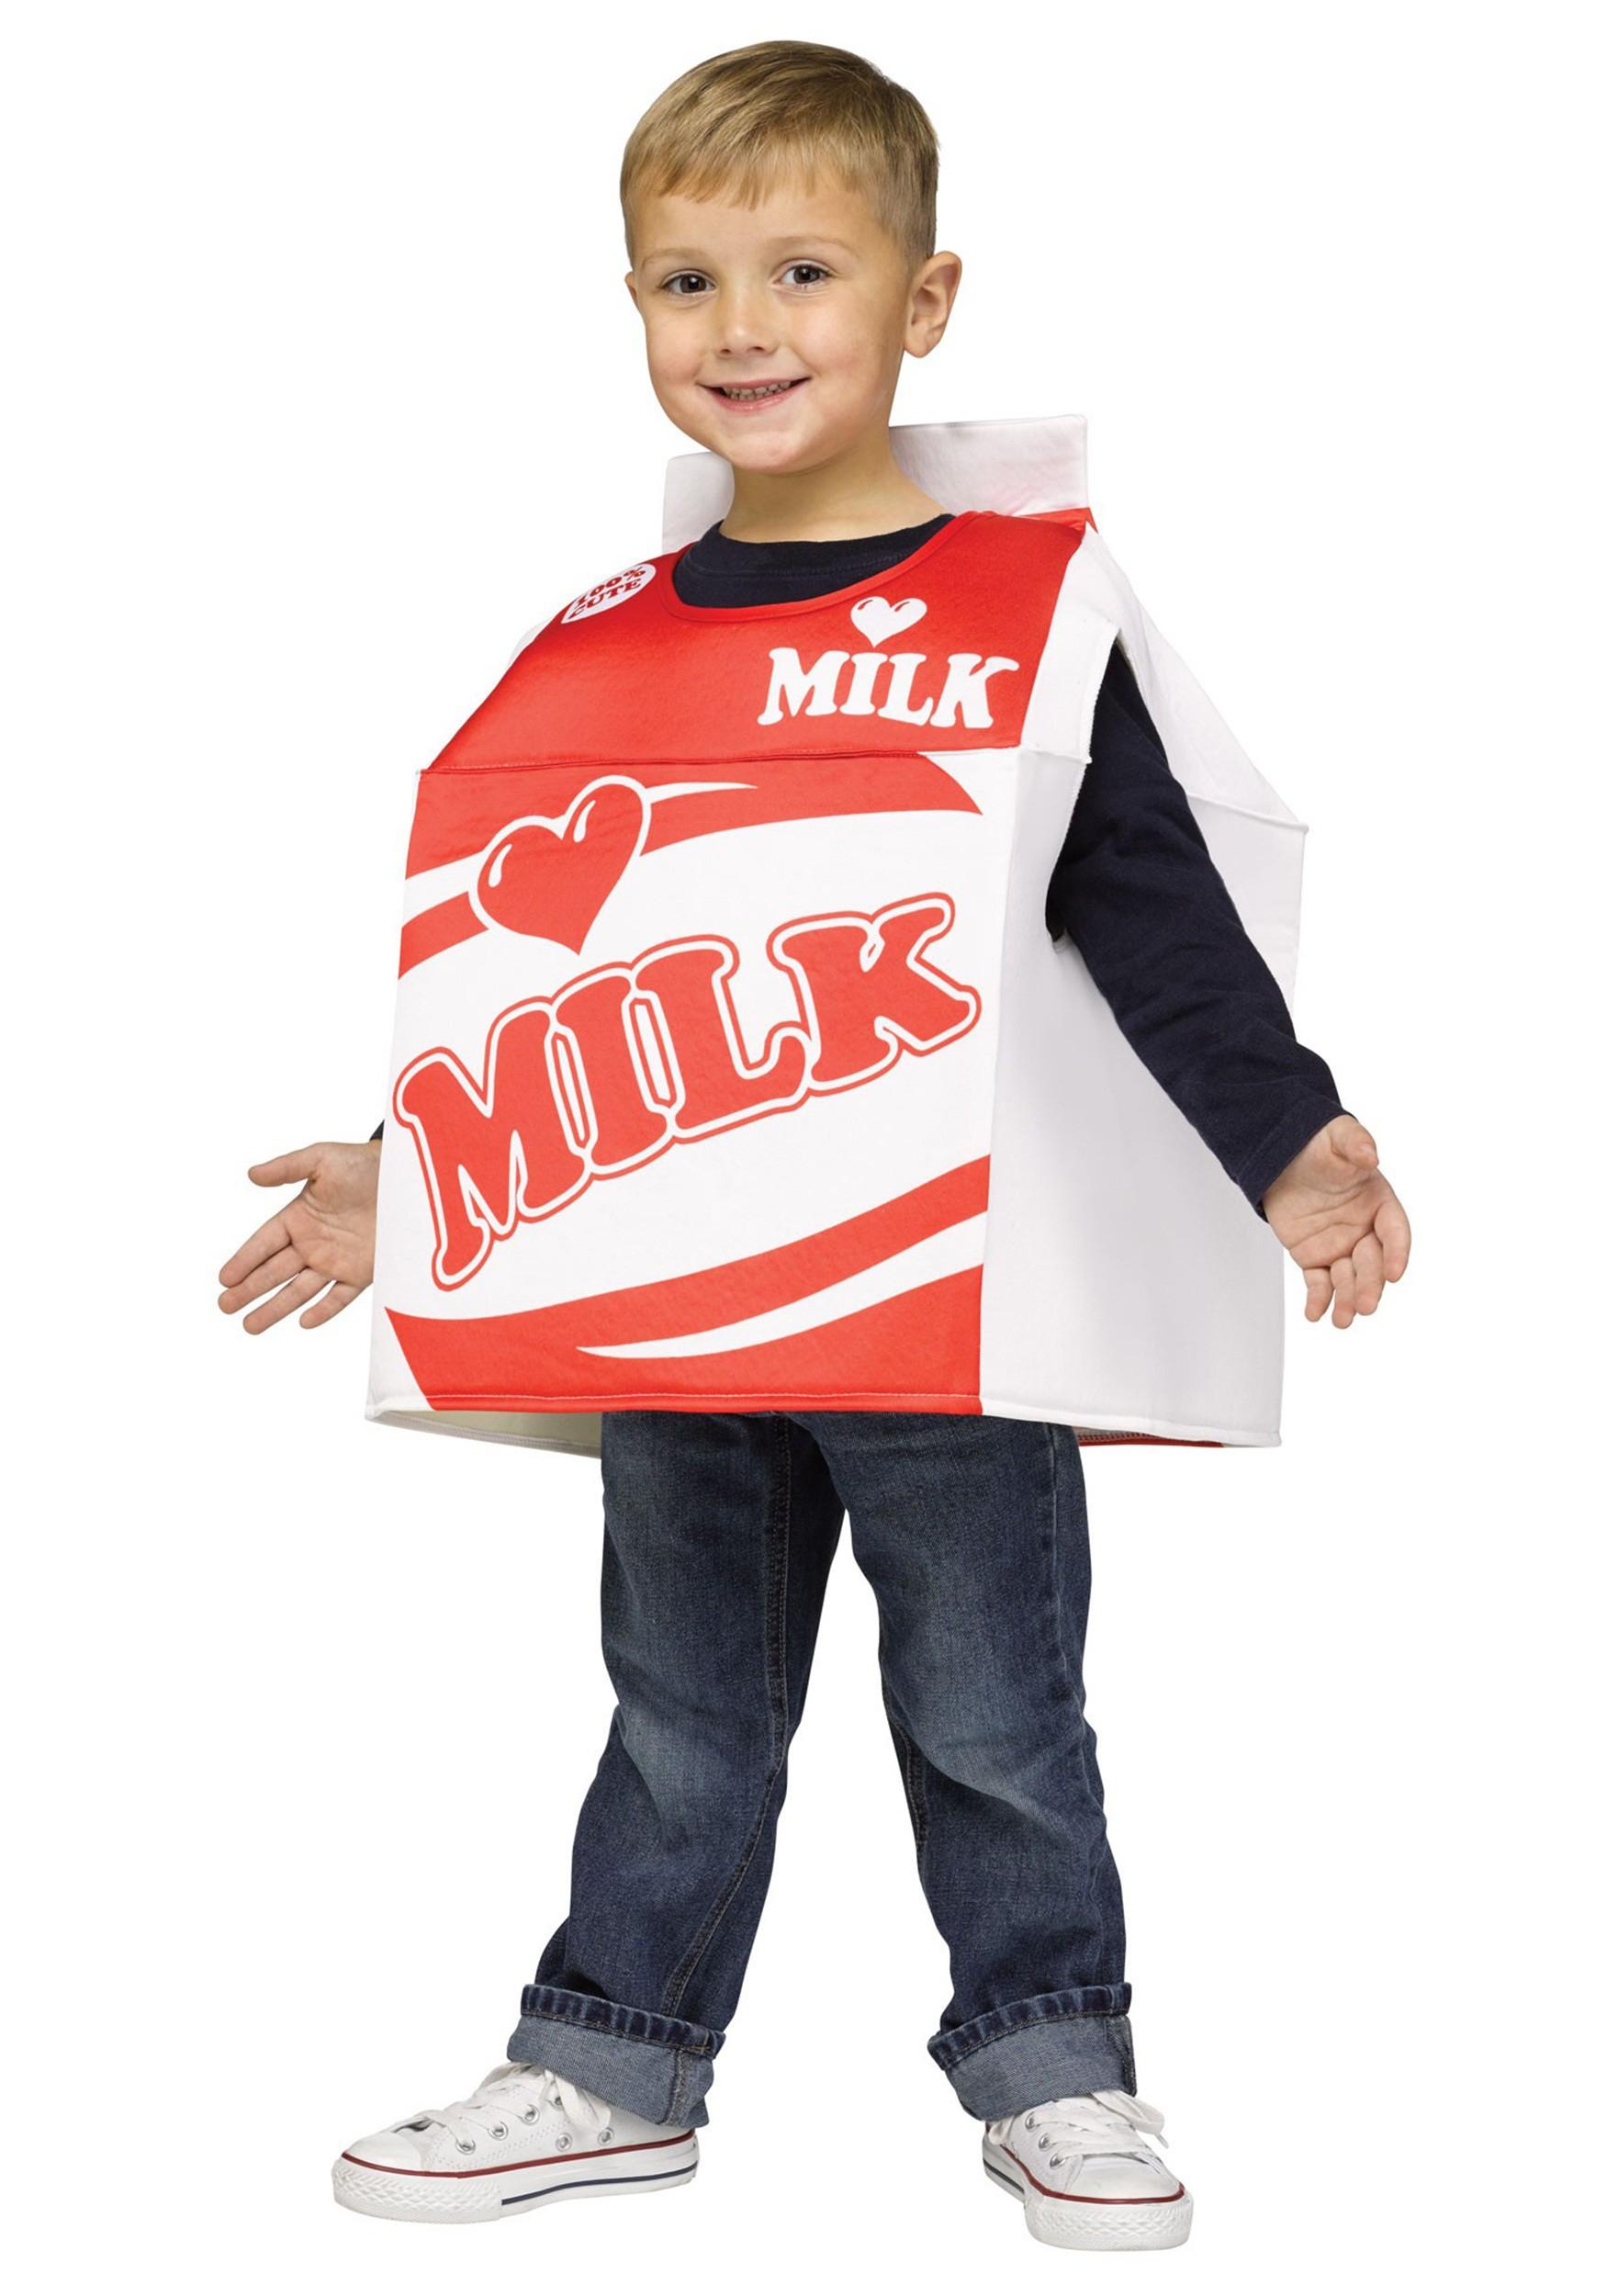 saelig how to buy milk